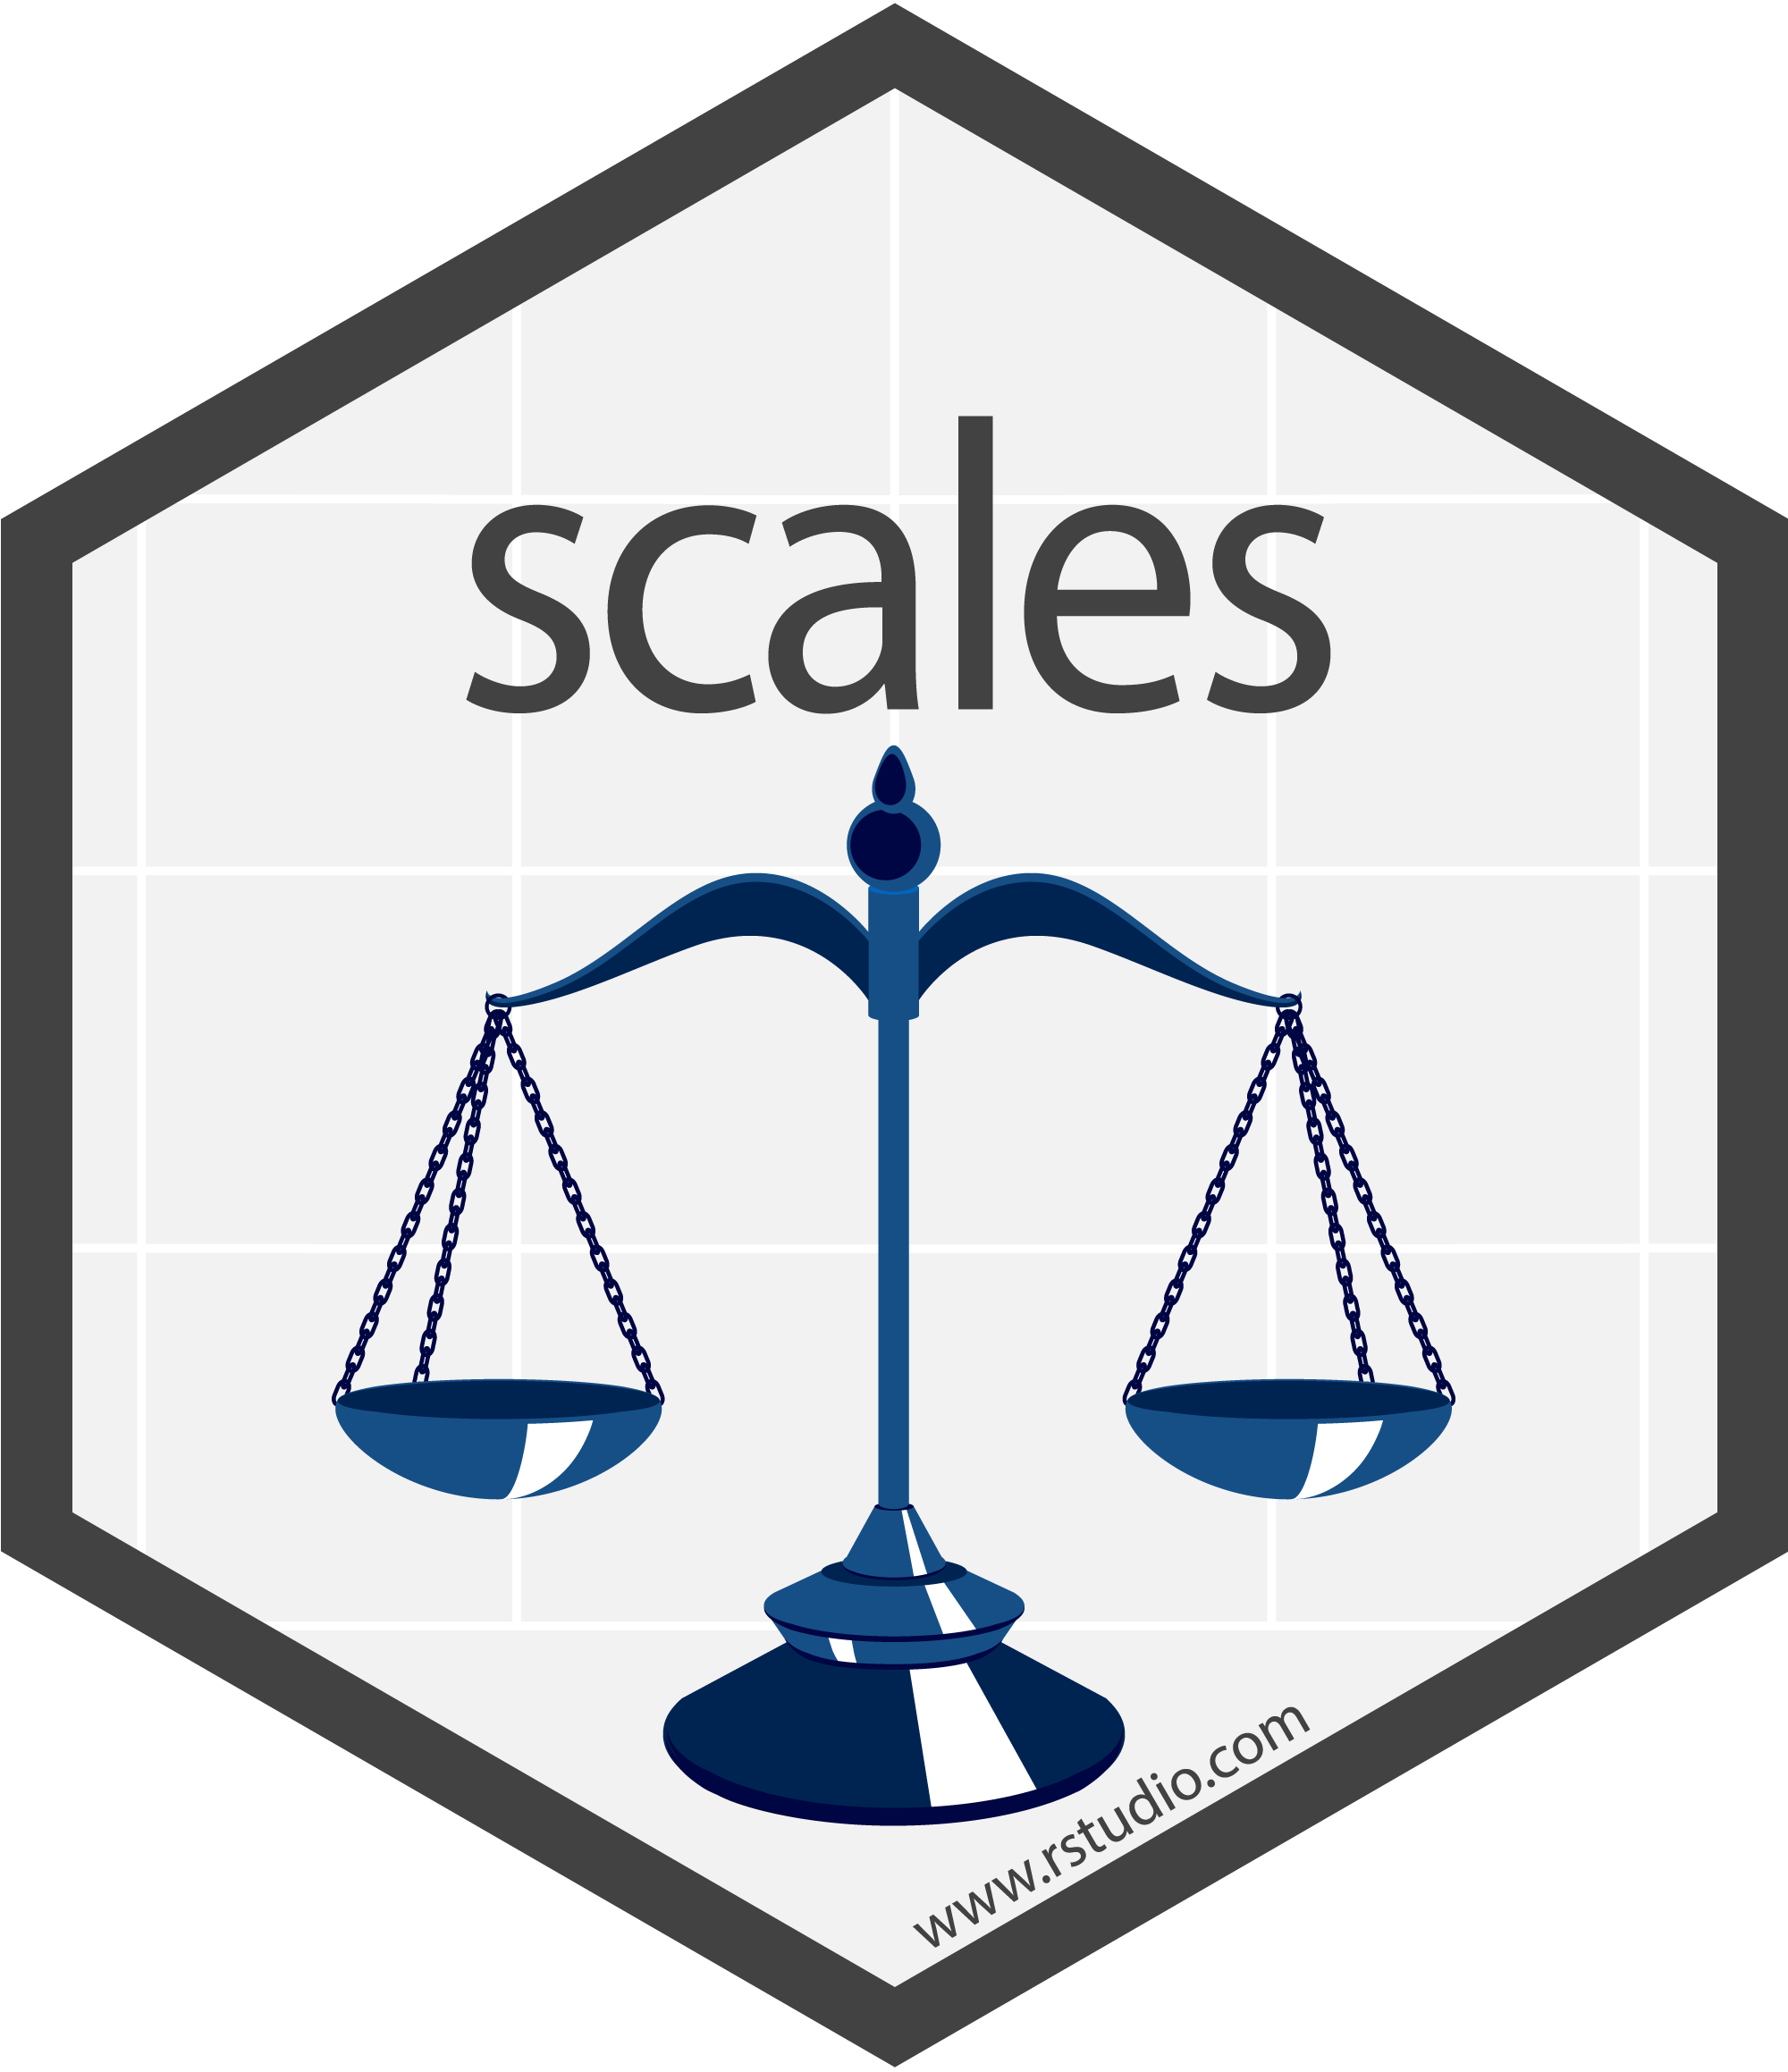 r-cran-scales avatar